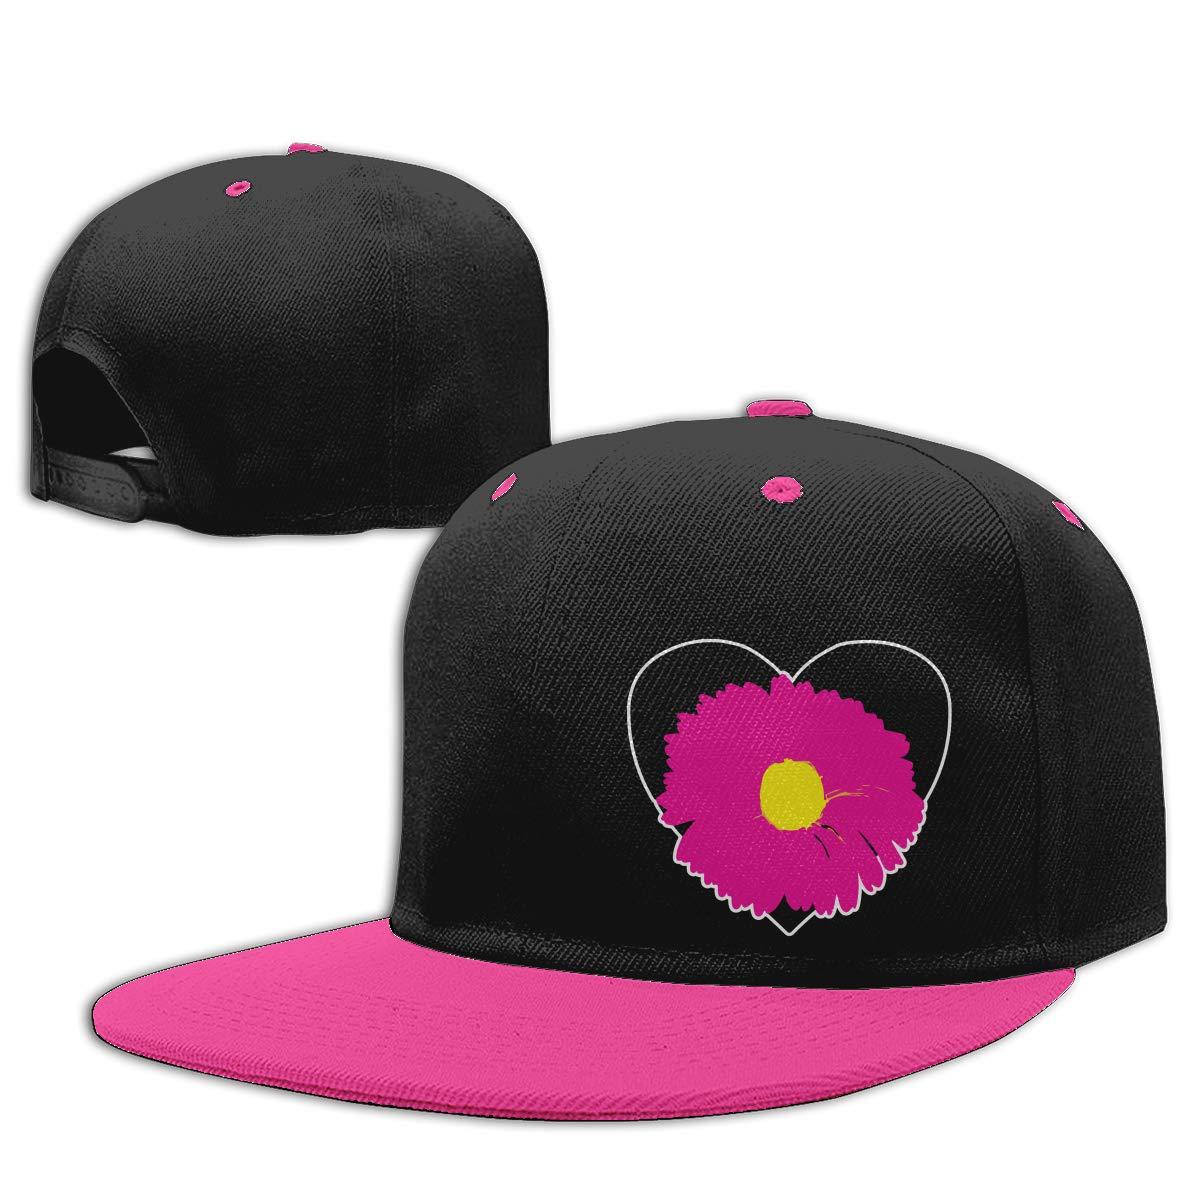 Black Heart Pink Flower Adjustable Hip-Hop Baseball Caps NMG-01 Women Men Trucker Cap